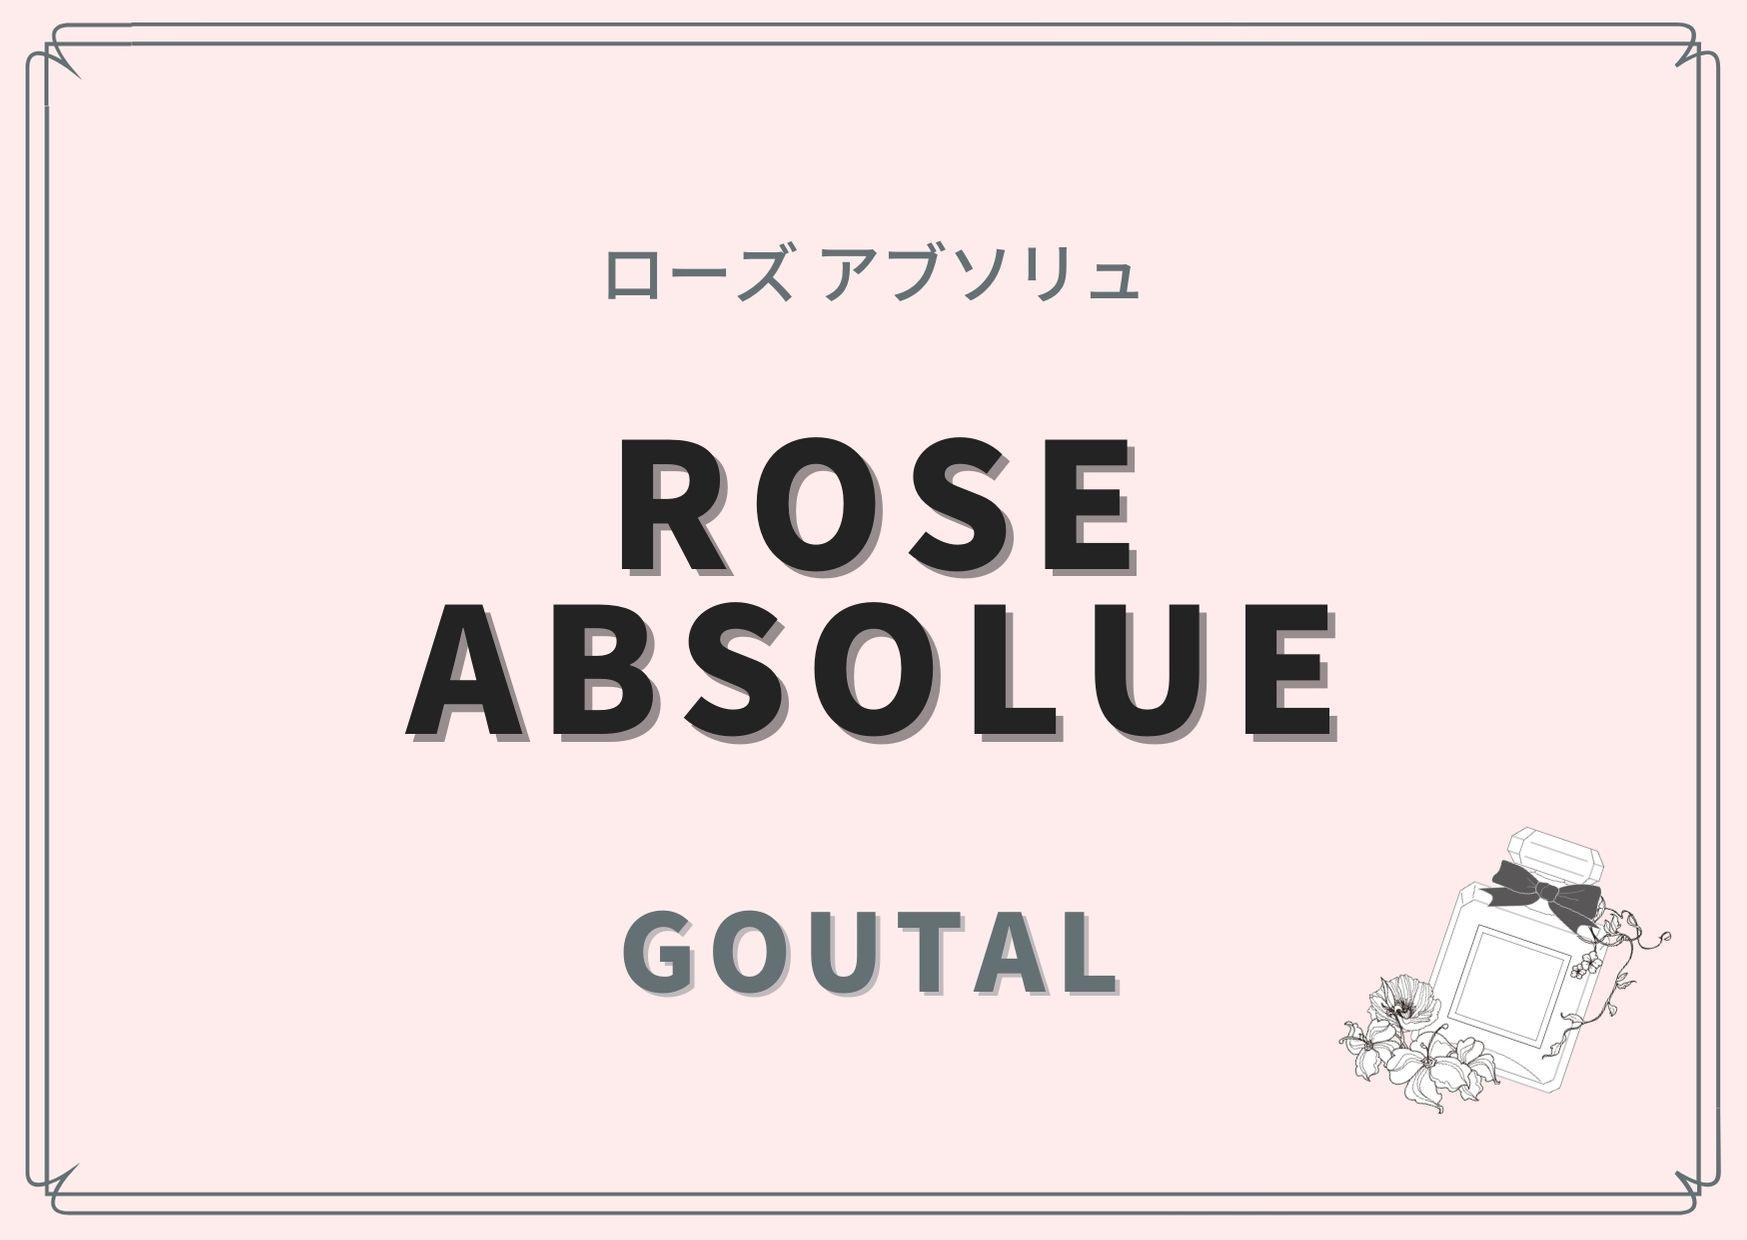 ROSE ABSOLUE(ローズ アブソリュ)/ANNICK GOUTAL(アニック グタール)